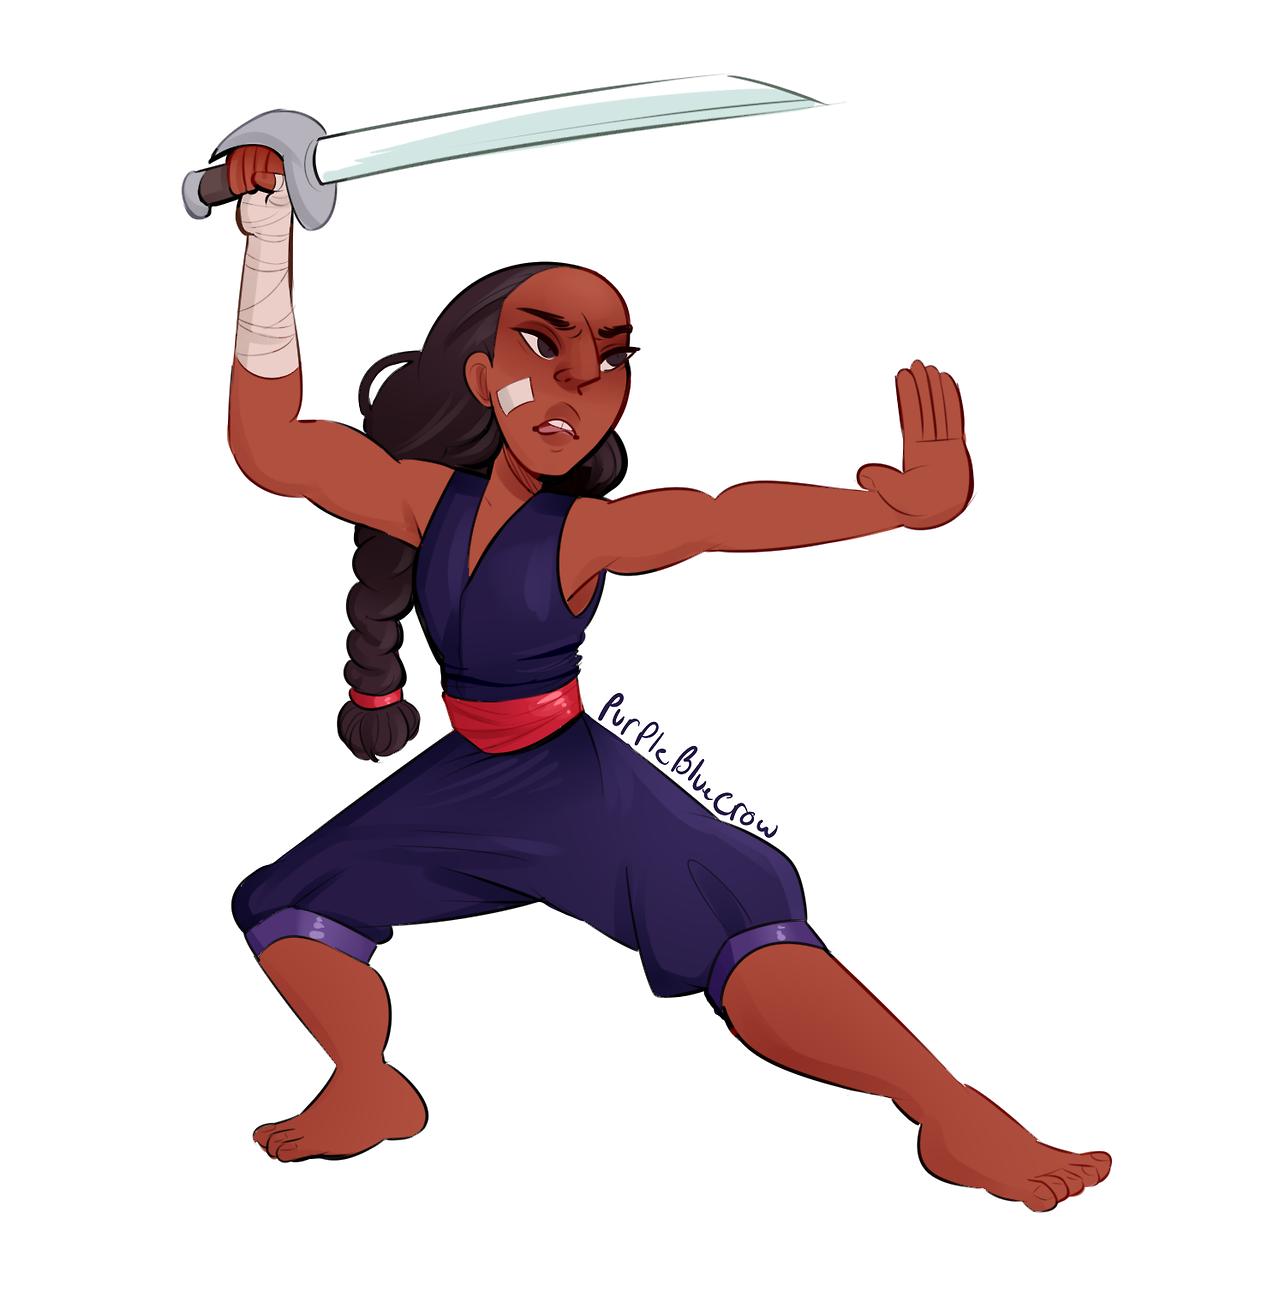 Connie! (she so cool!!)